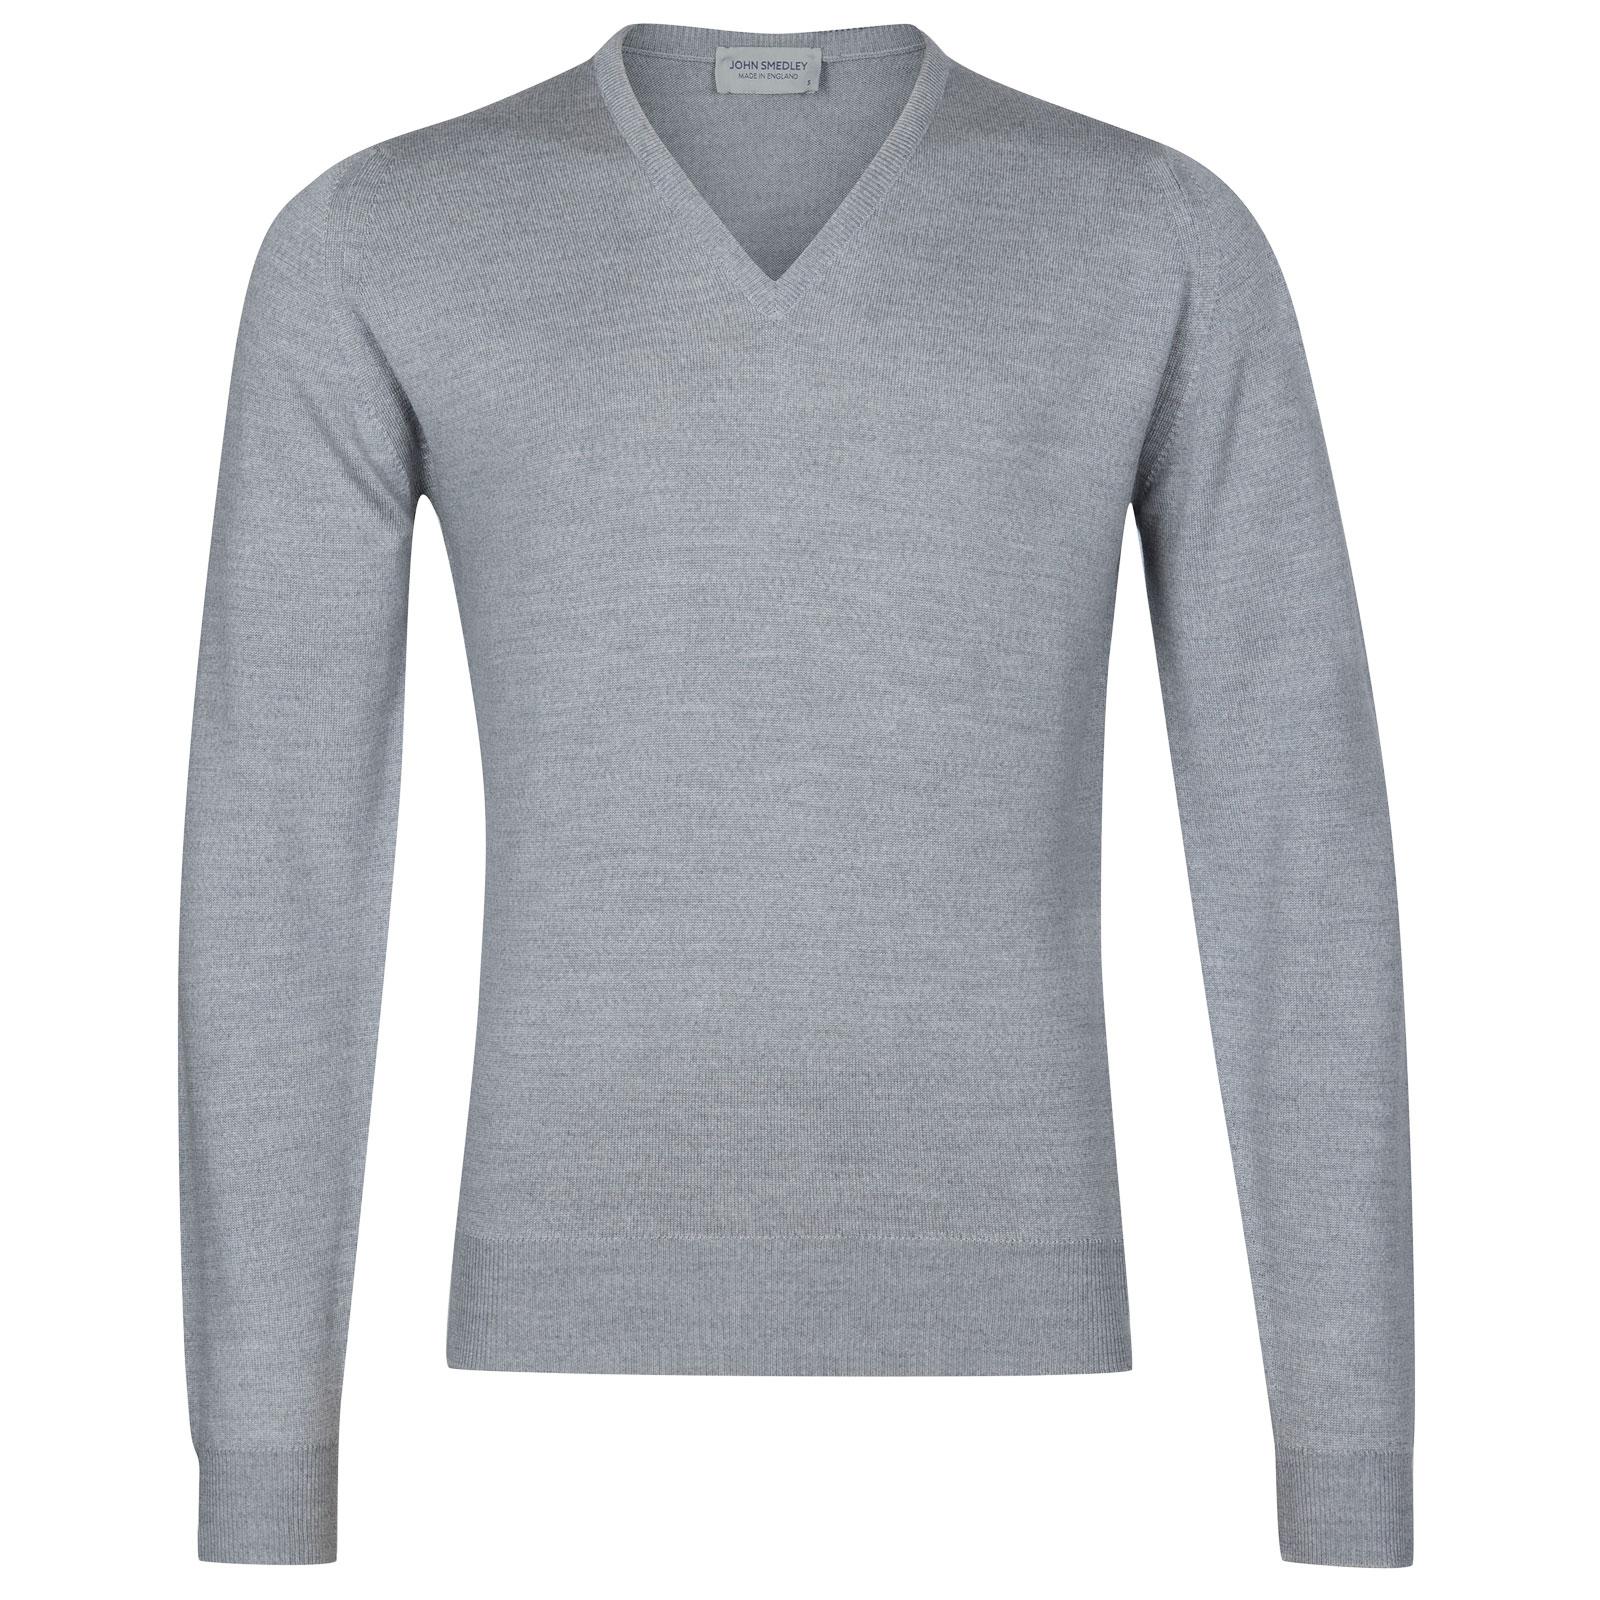 John Smedley Riber Merino Wool Pullover in Bardot Grey-XL